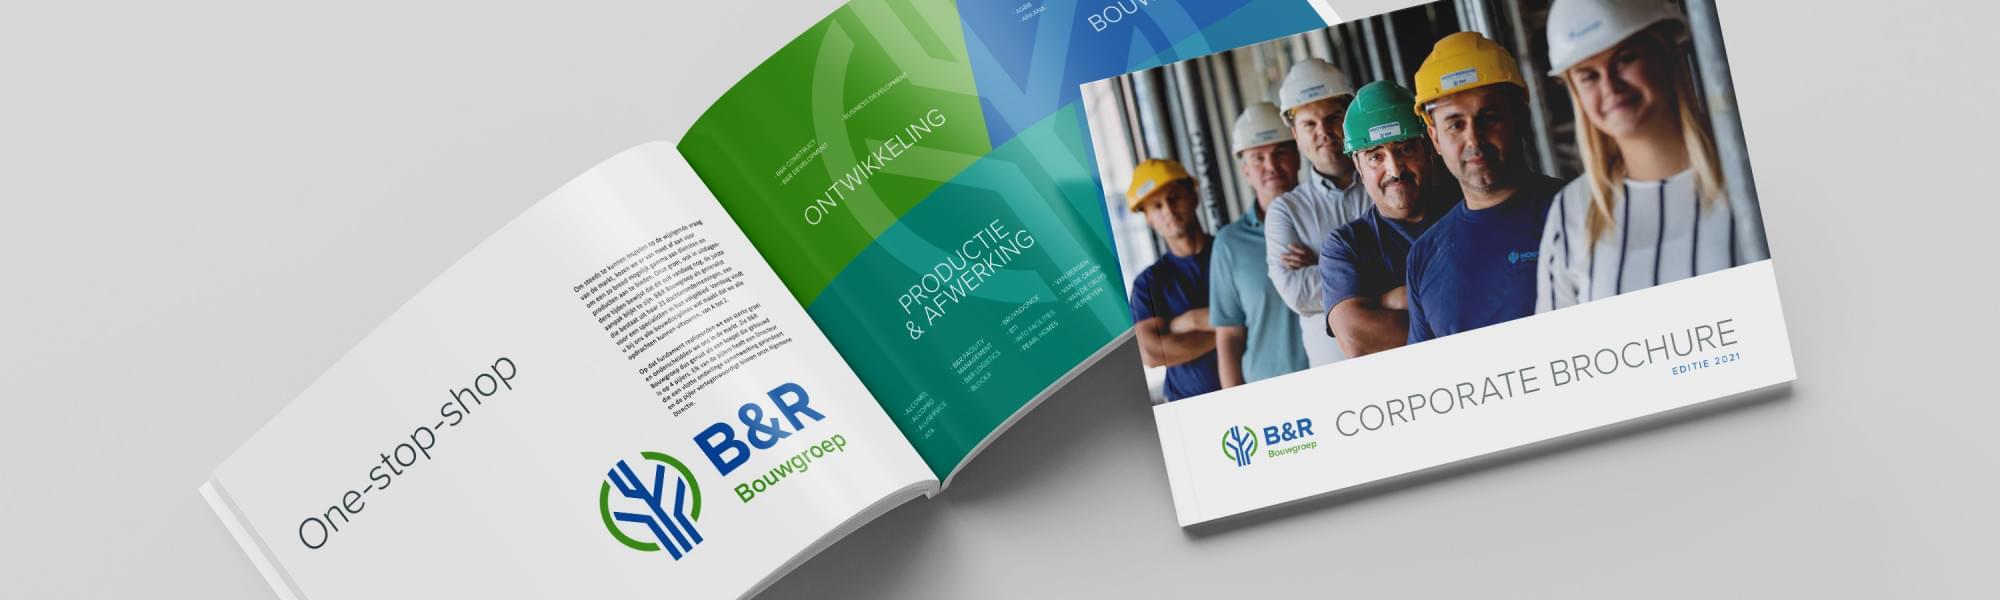 Corporate brochure21